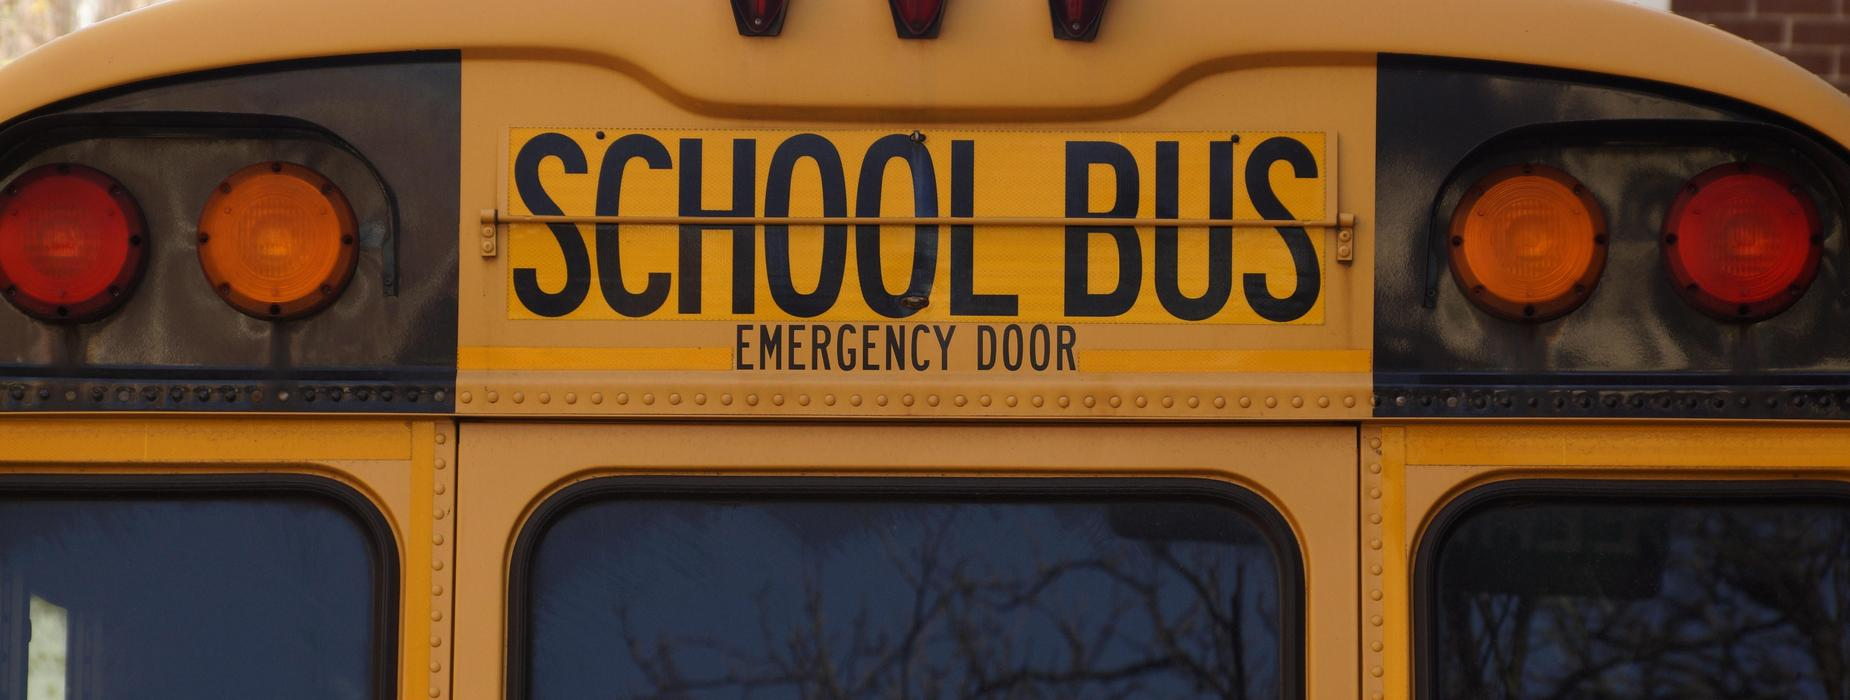 Jersey City Public Schools